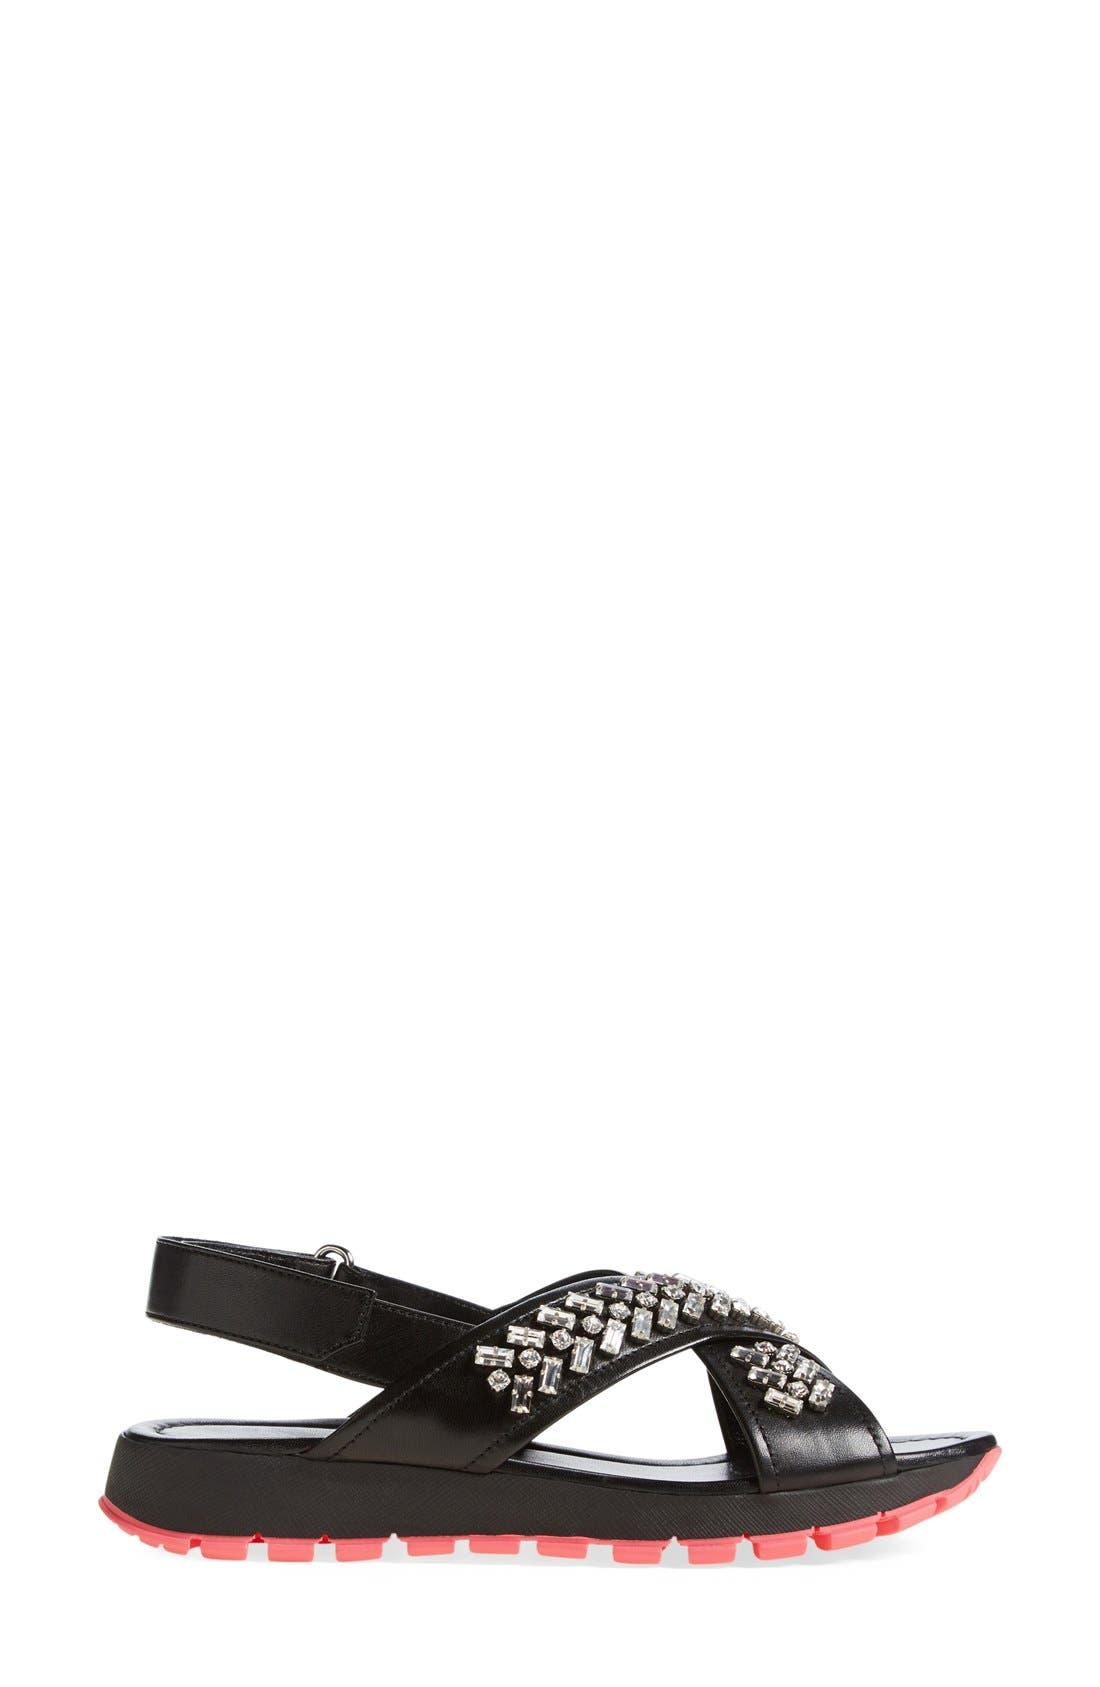 Swarovski Crystal Embellished Crisscross Sandal,                             Alternate thumbnail 2, color,                             001